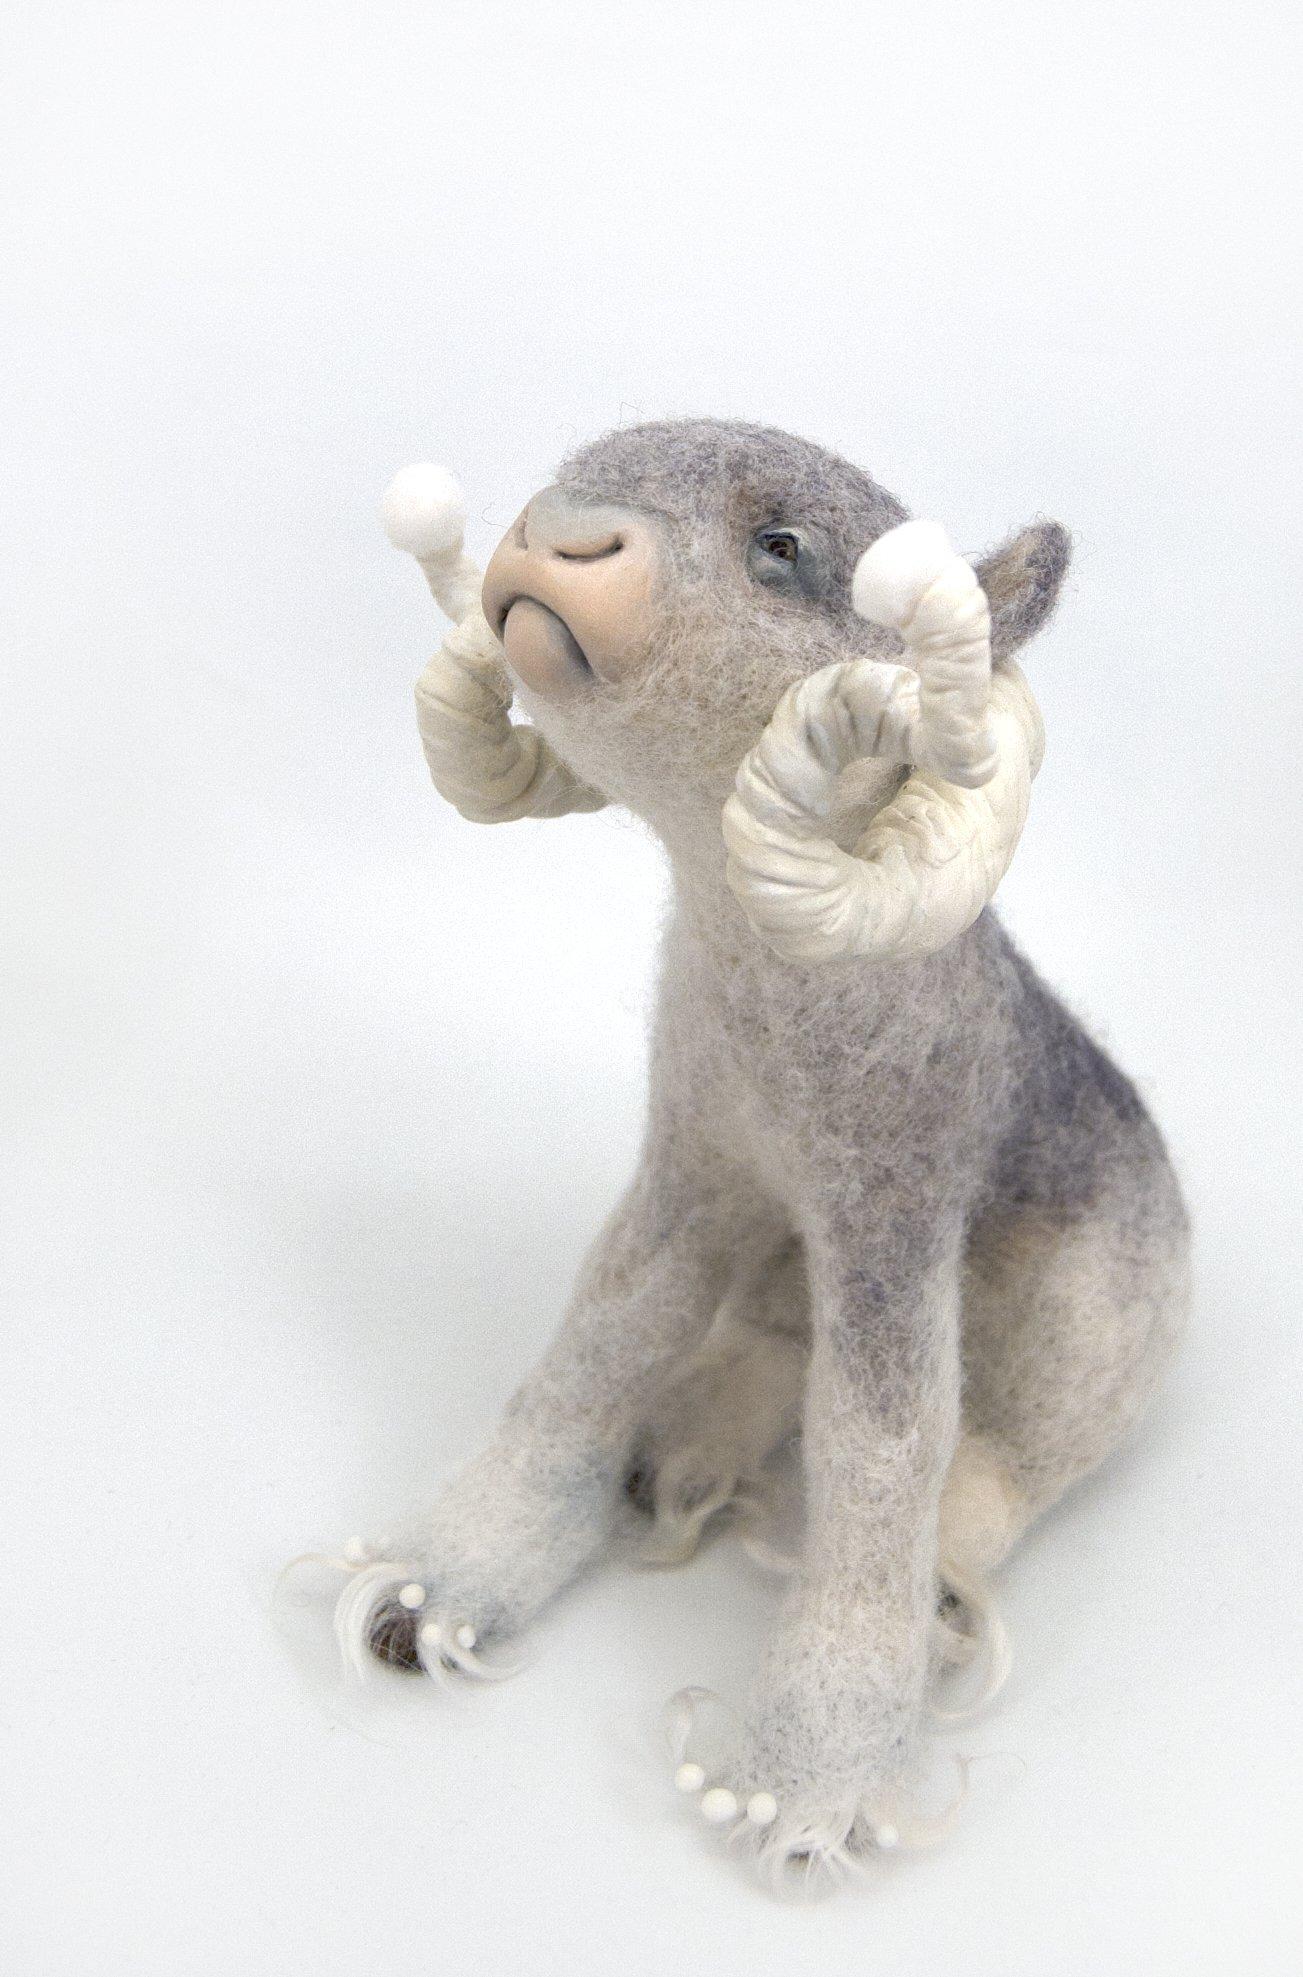 Needle felt snow creature with horns - Imaginary animal sculpture by Canadian artist Karina Kalvaitis